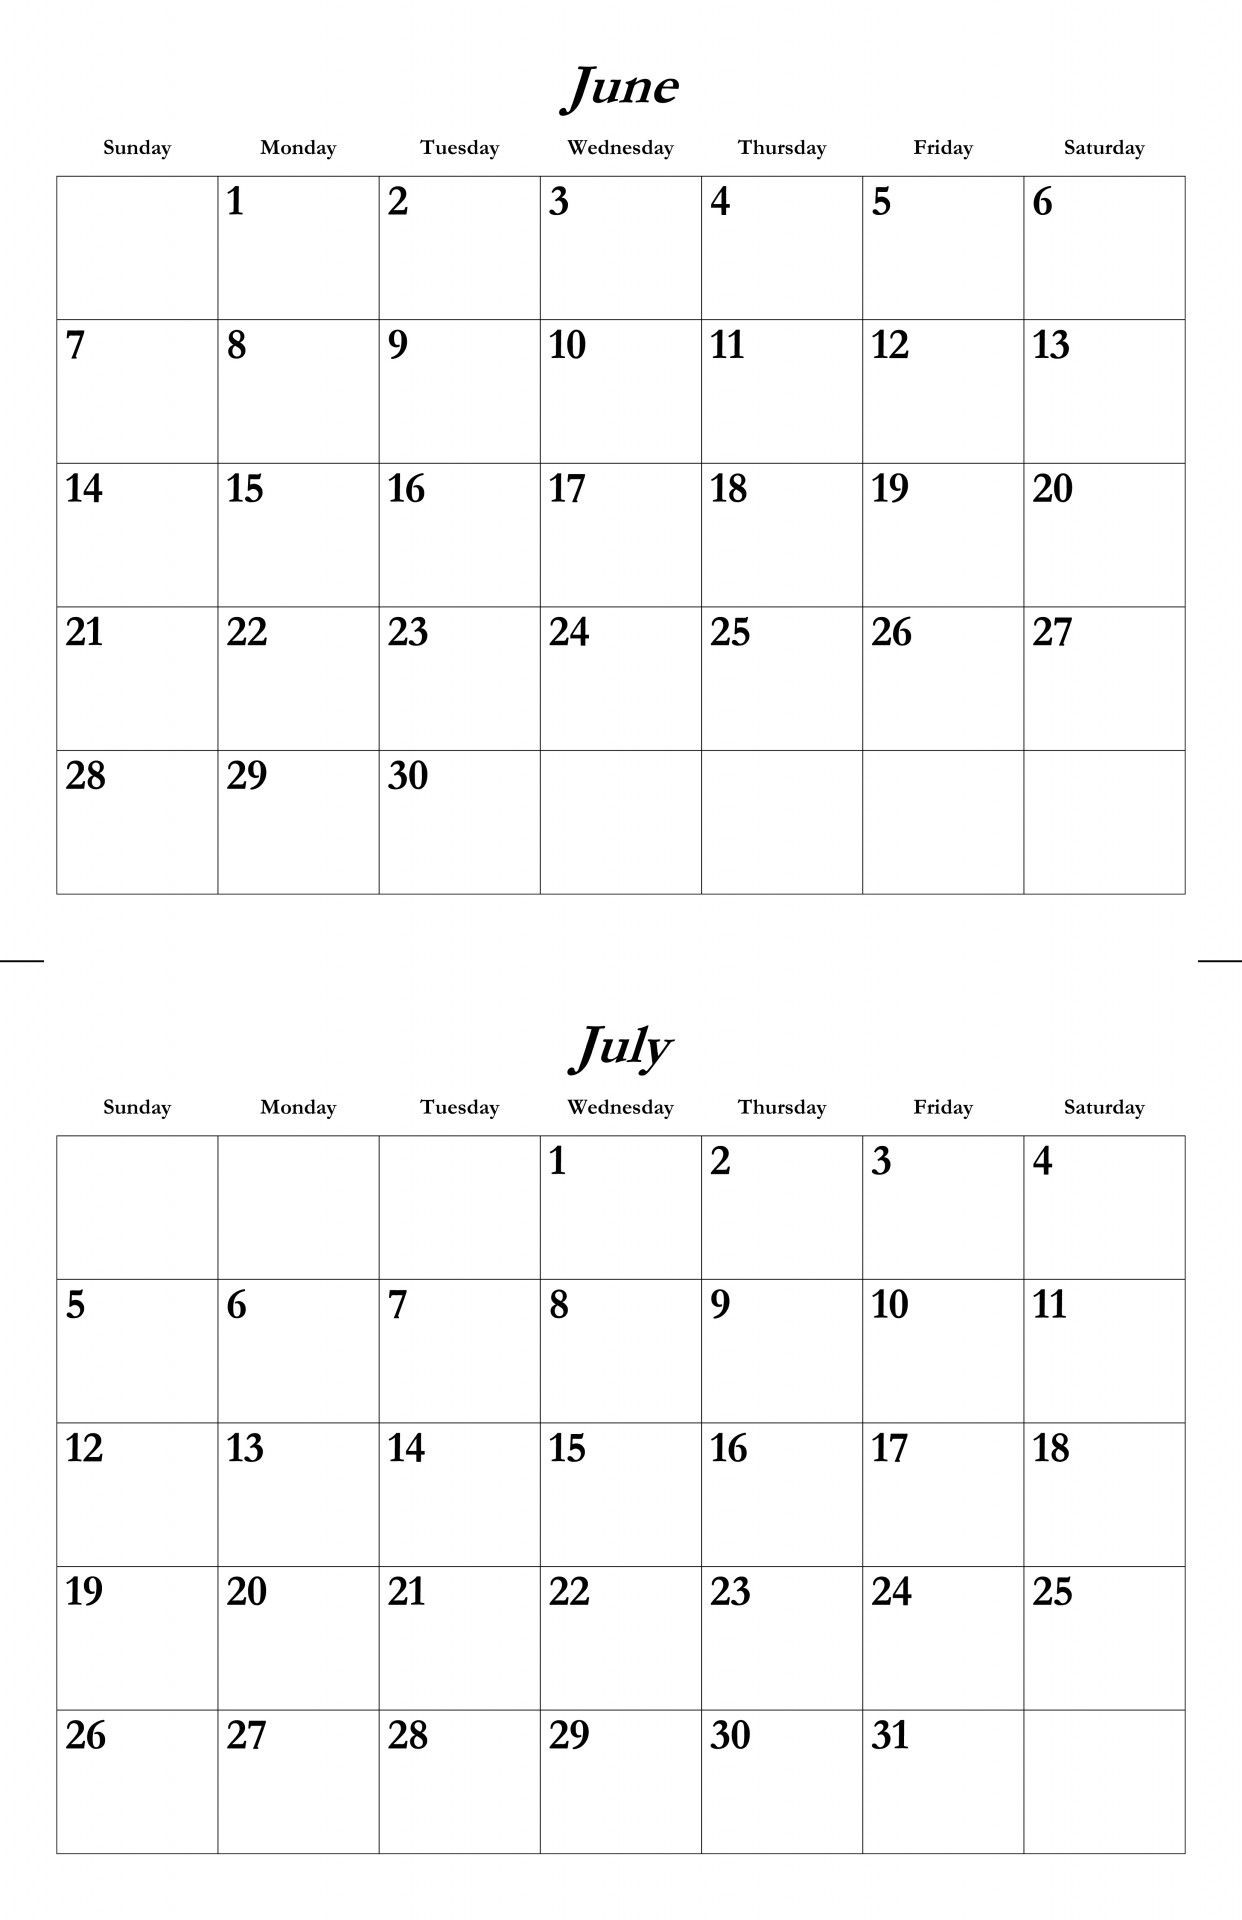 June July August 2018 Calendar Three Month Calendar Template in June And July Calendar Printable